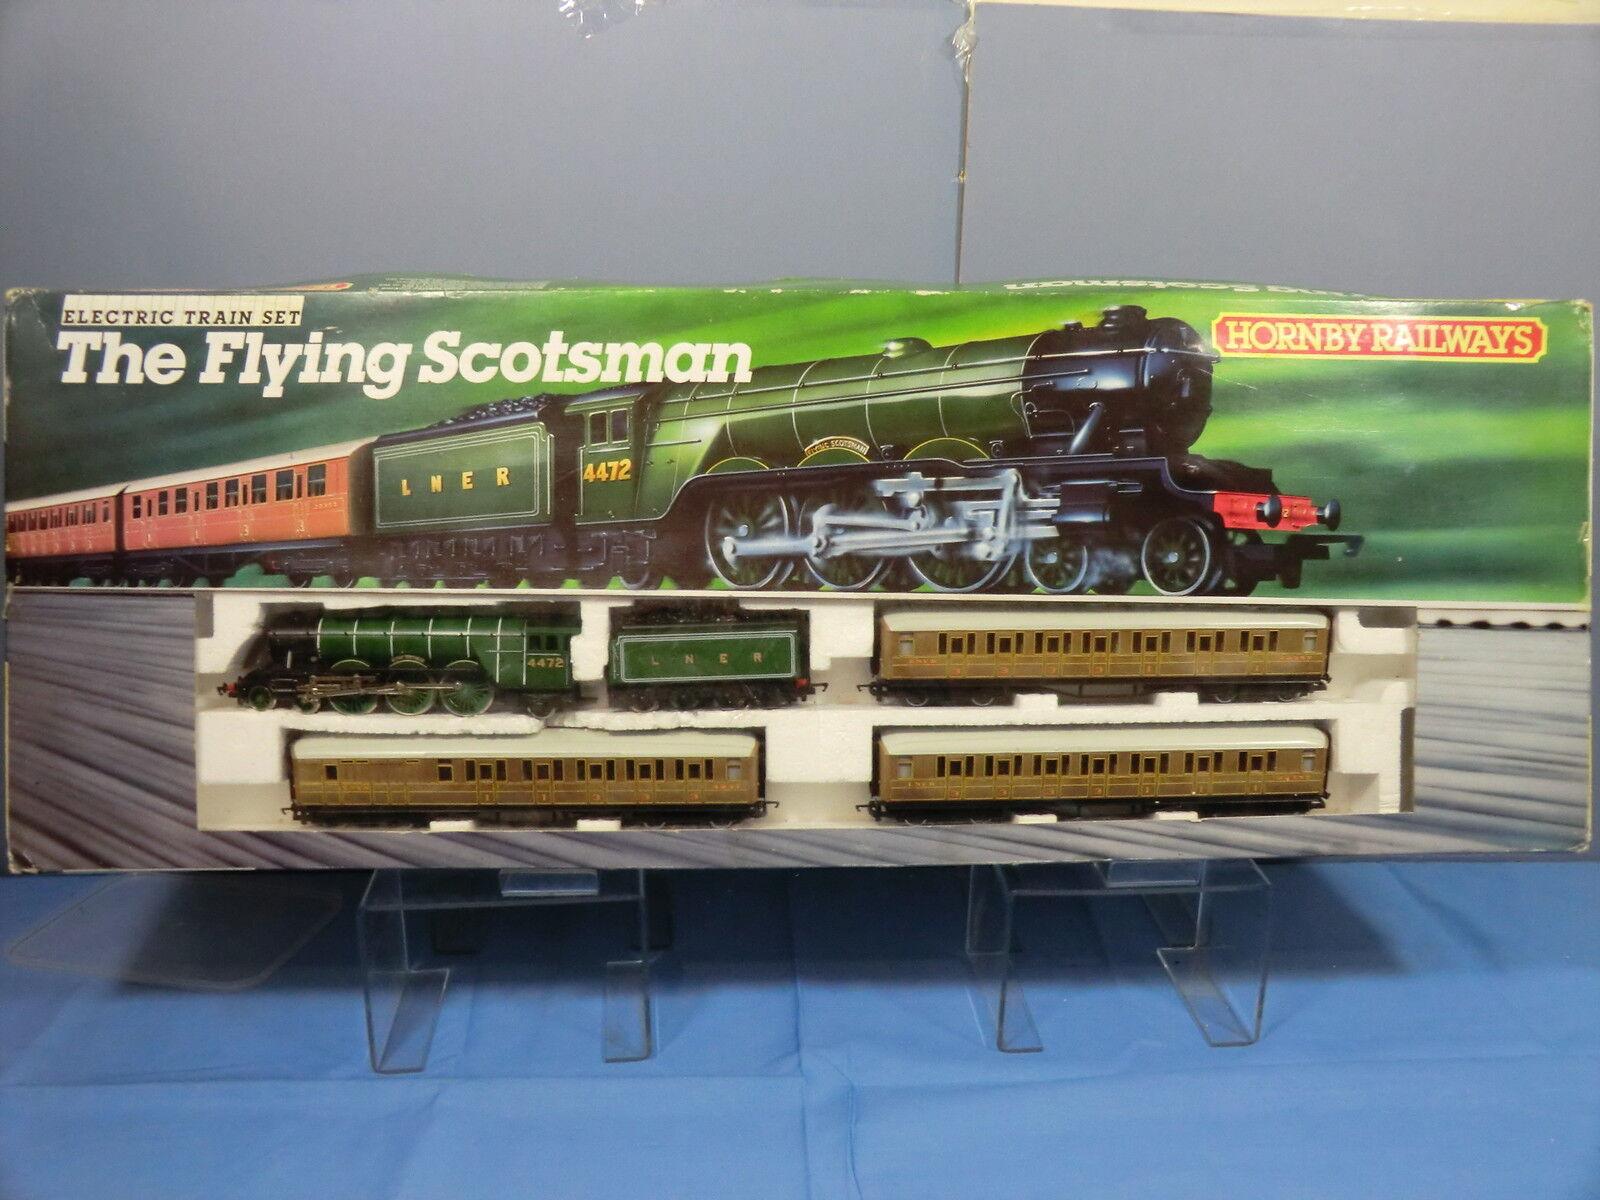 HORNBY RAILWAYS MODEL No.778 LNER FLYING SCOTSMAN PASSENGER TRAIN  SET VN MIB